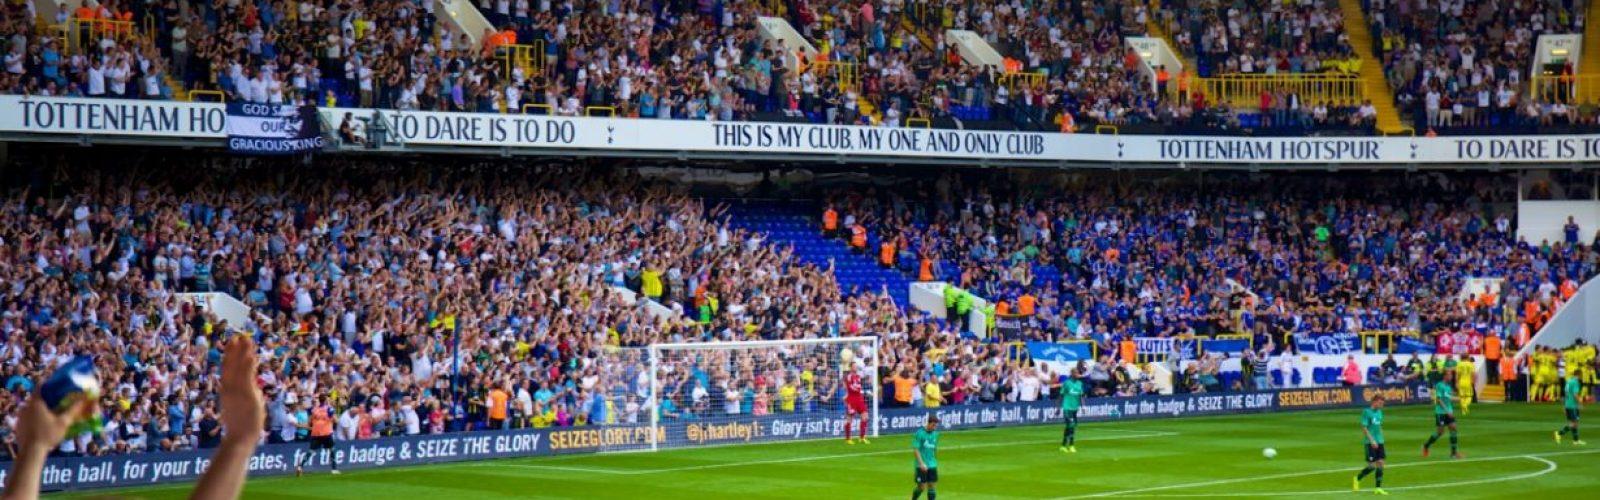 1882 announcement: Tottenham v Partizan Belgrade – Europa League